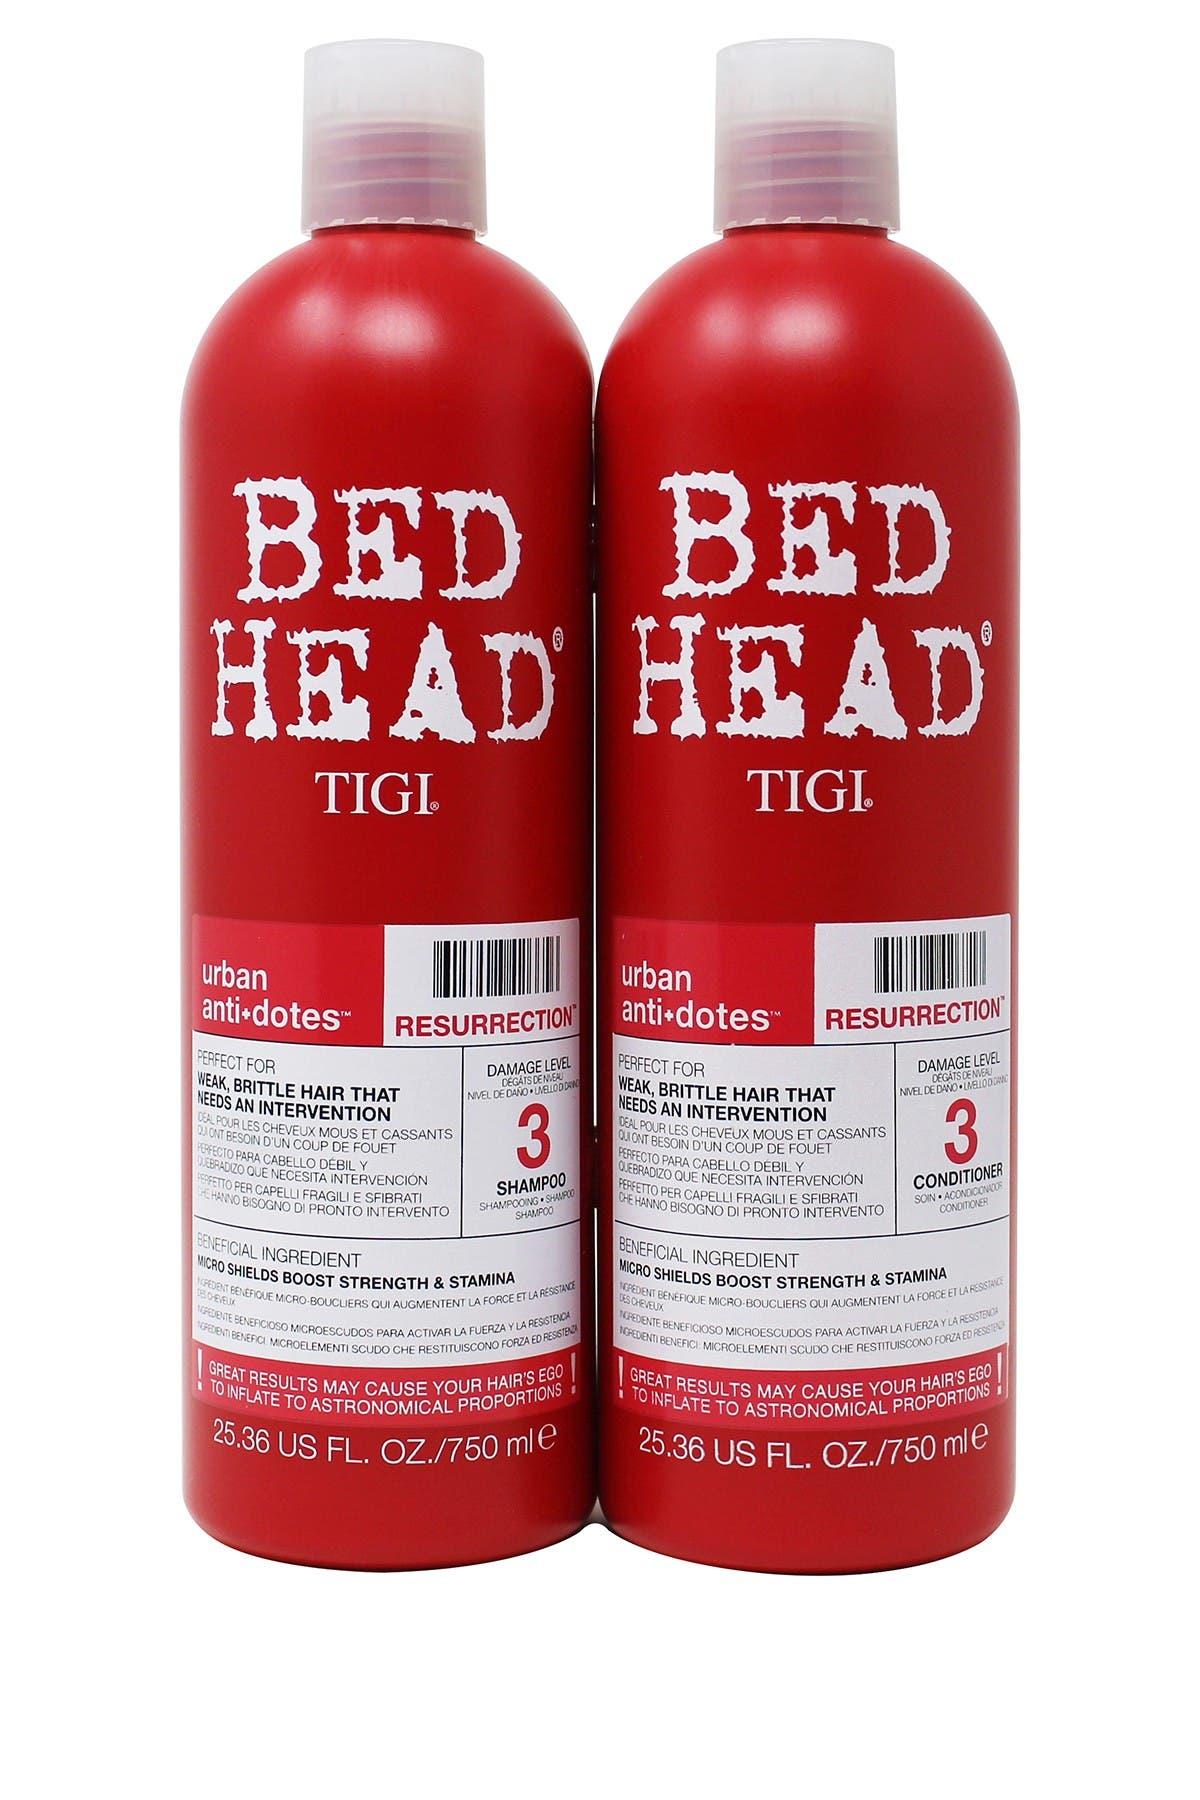 Image of CATWALK by TIGI Big Head Urban Anti + Dotes Resurrection Shampoo & Conditioner Set